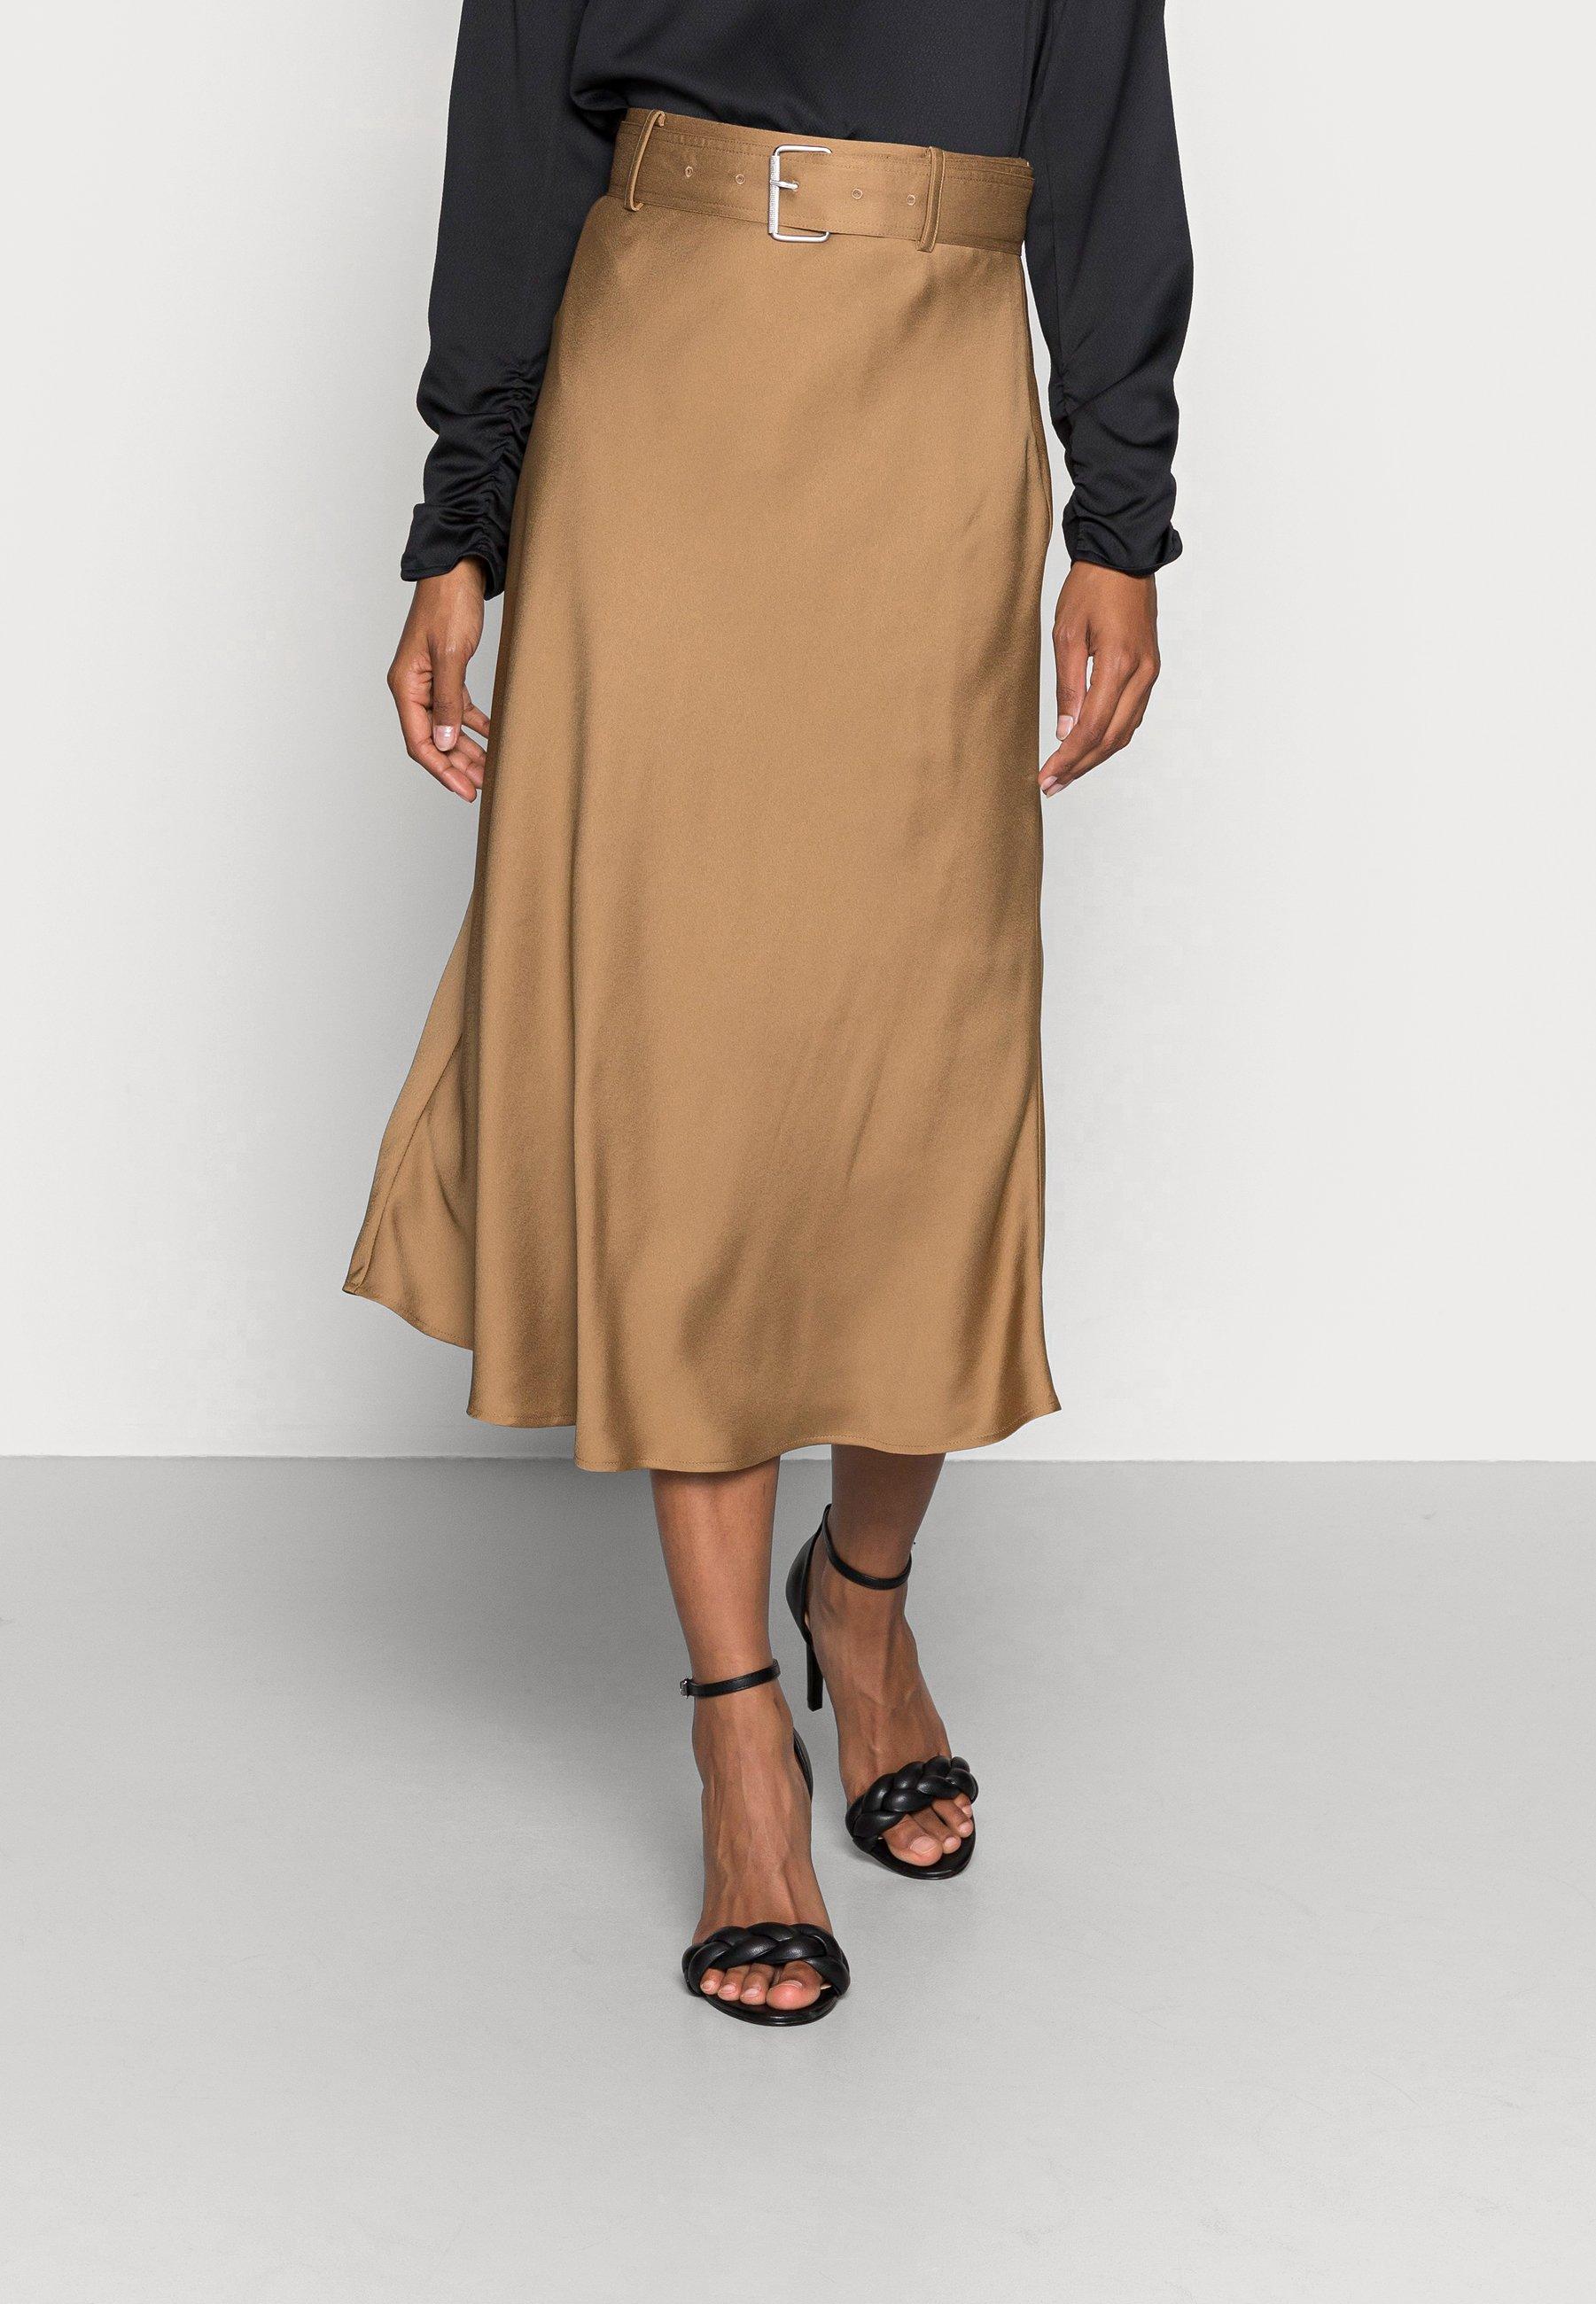 Femme ALANNAH SKIRT - Jupe longue